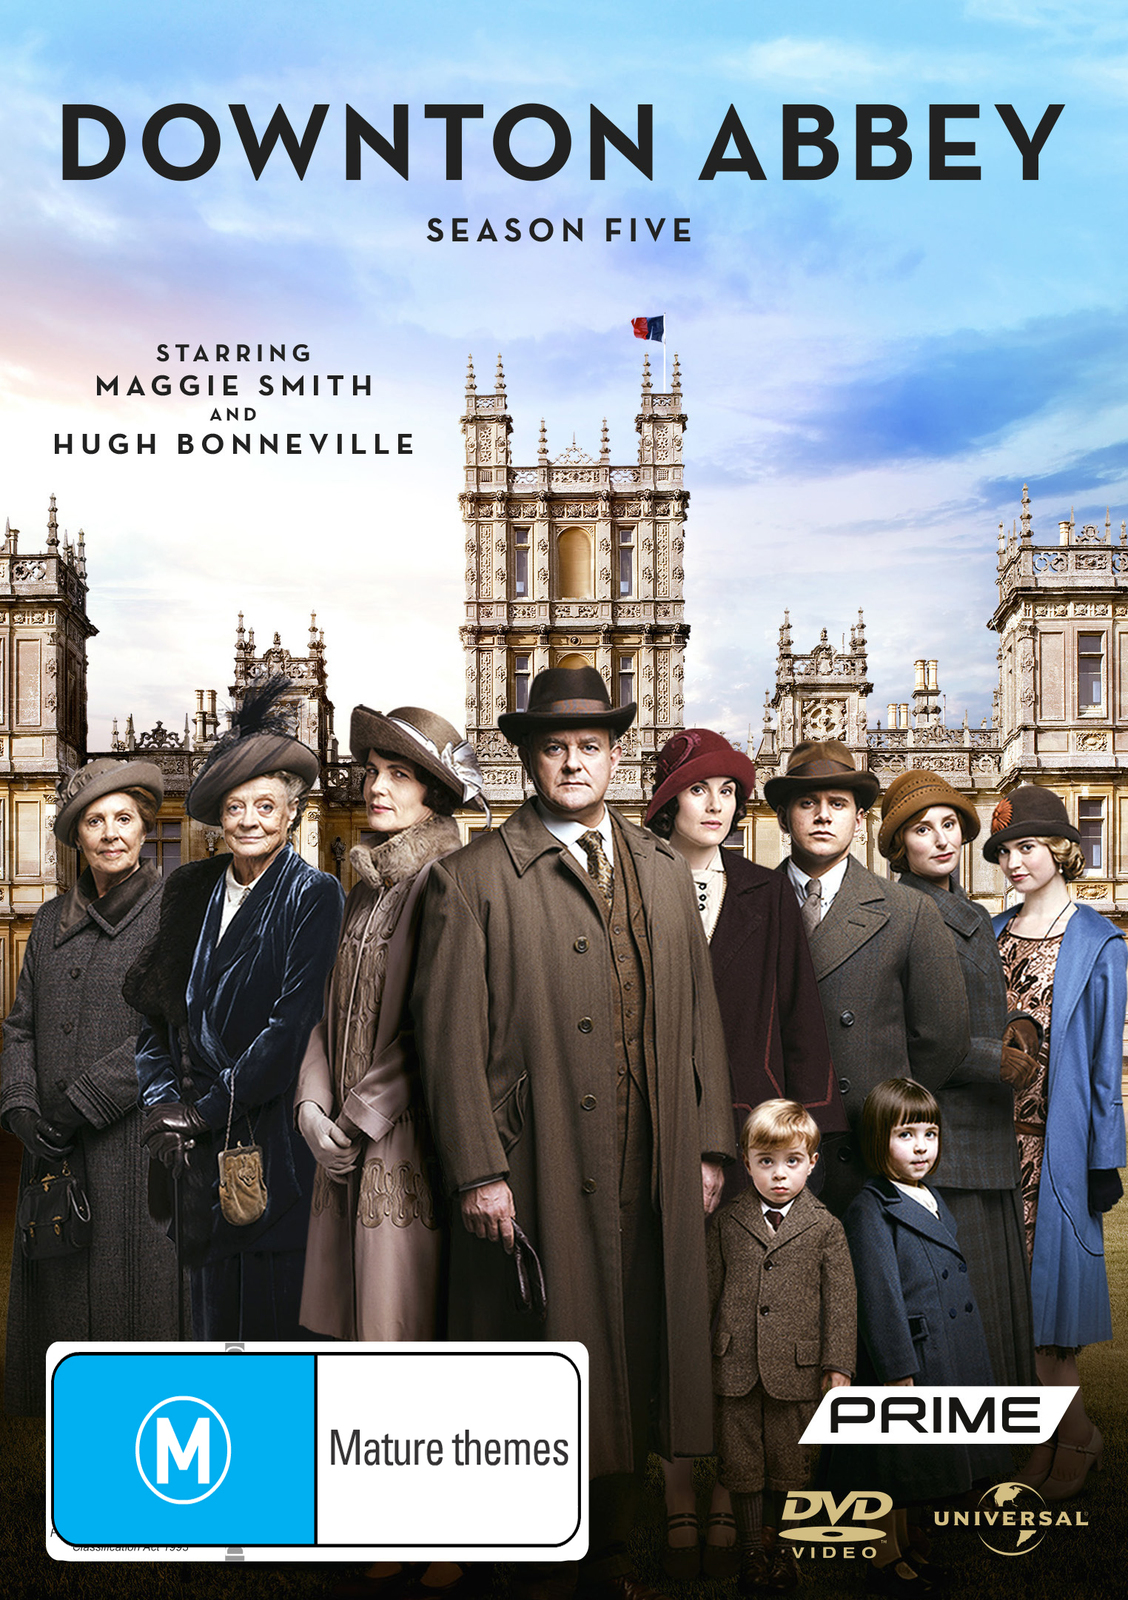 Downton Abbey - Season 5 on DVD image